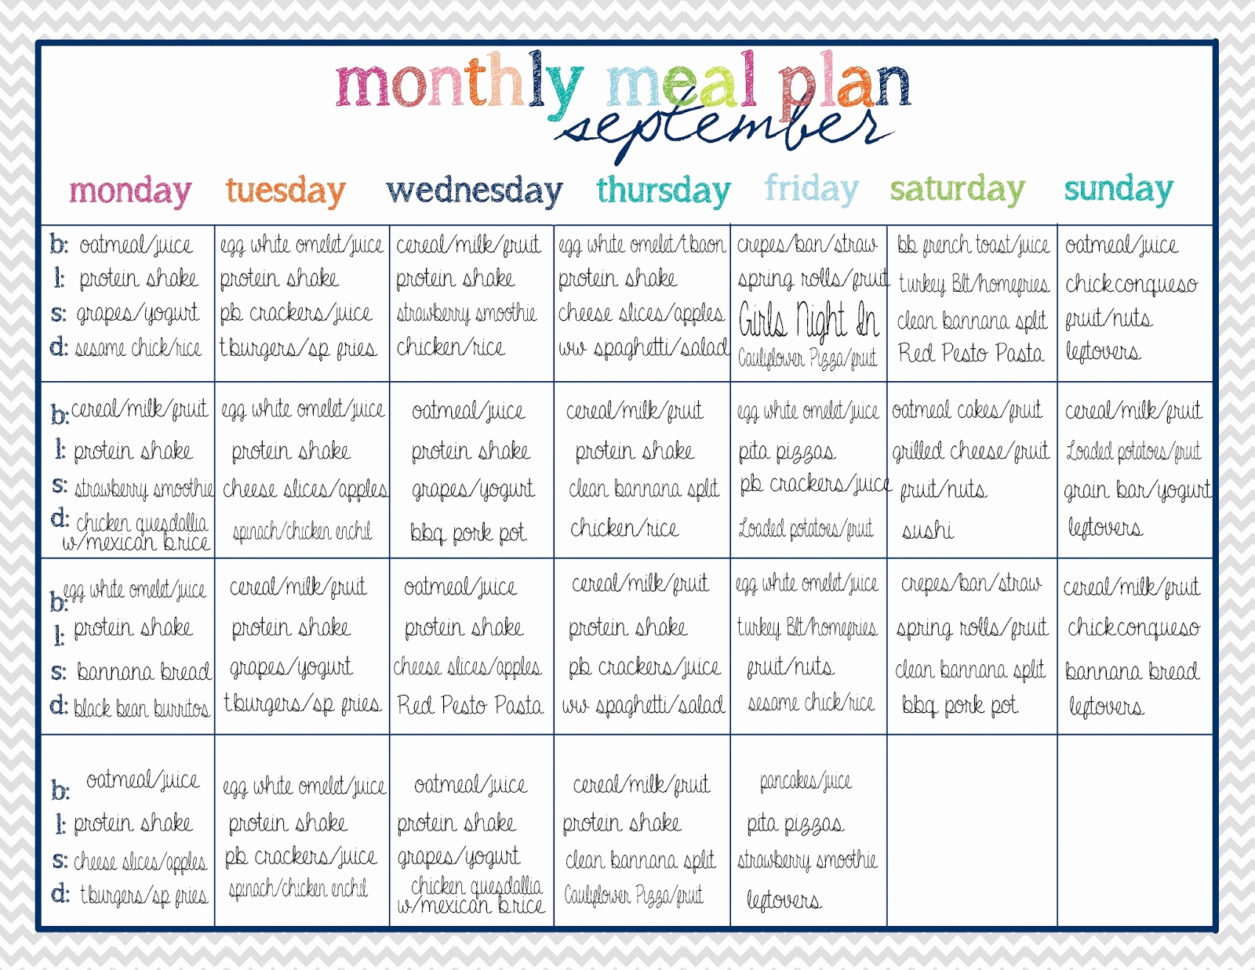 Fast Metabolism Diet Meal Plan Spreadsheet In Fast Metabolism Diet Meal Plan Spreadsheet Fresh Meal Plan